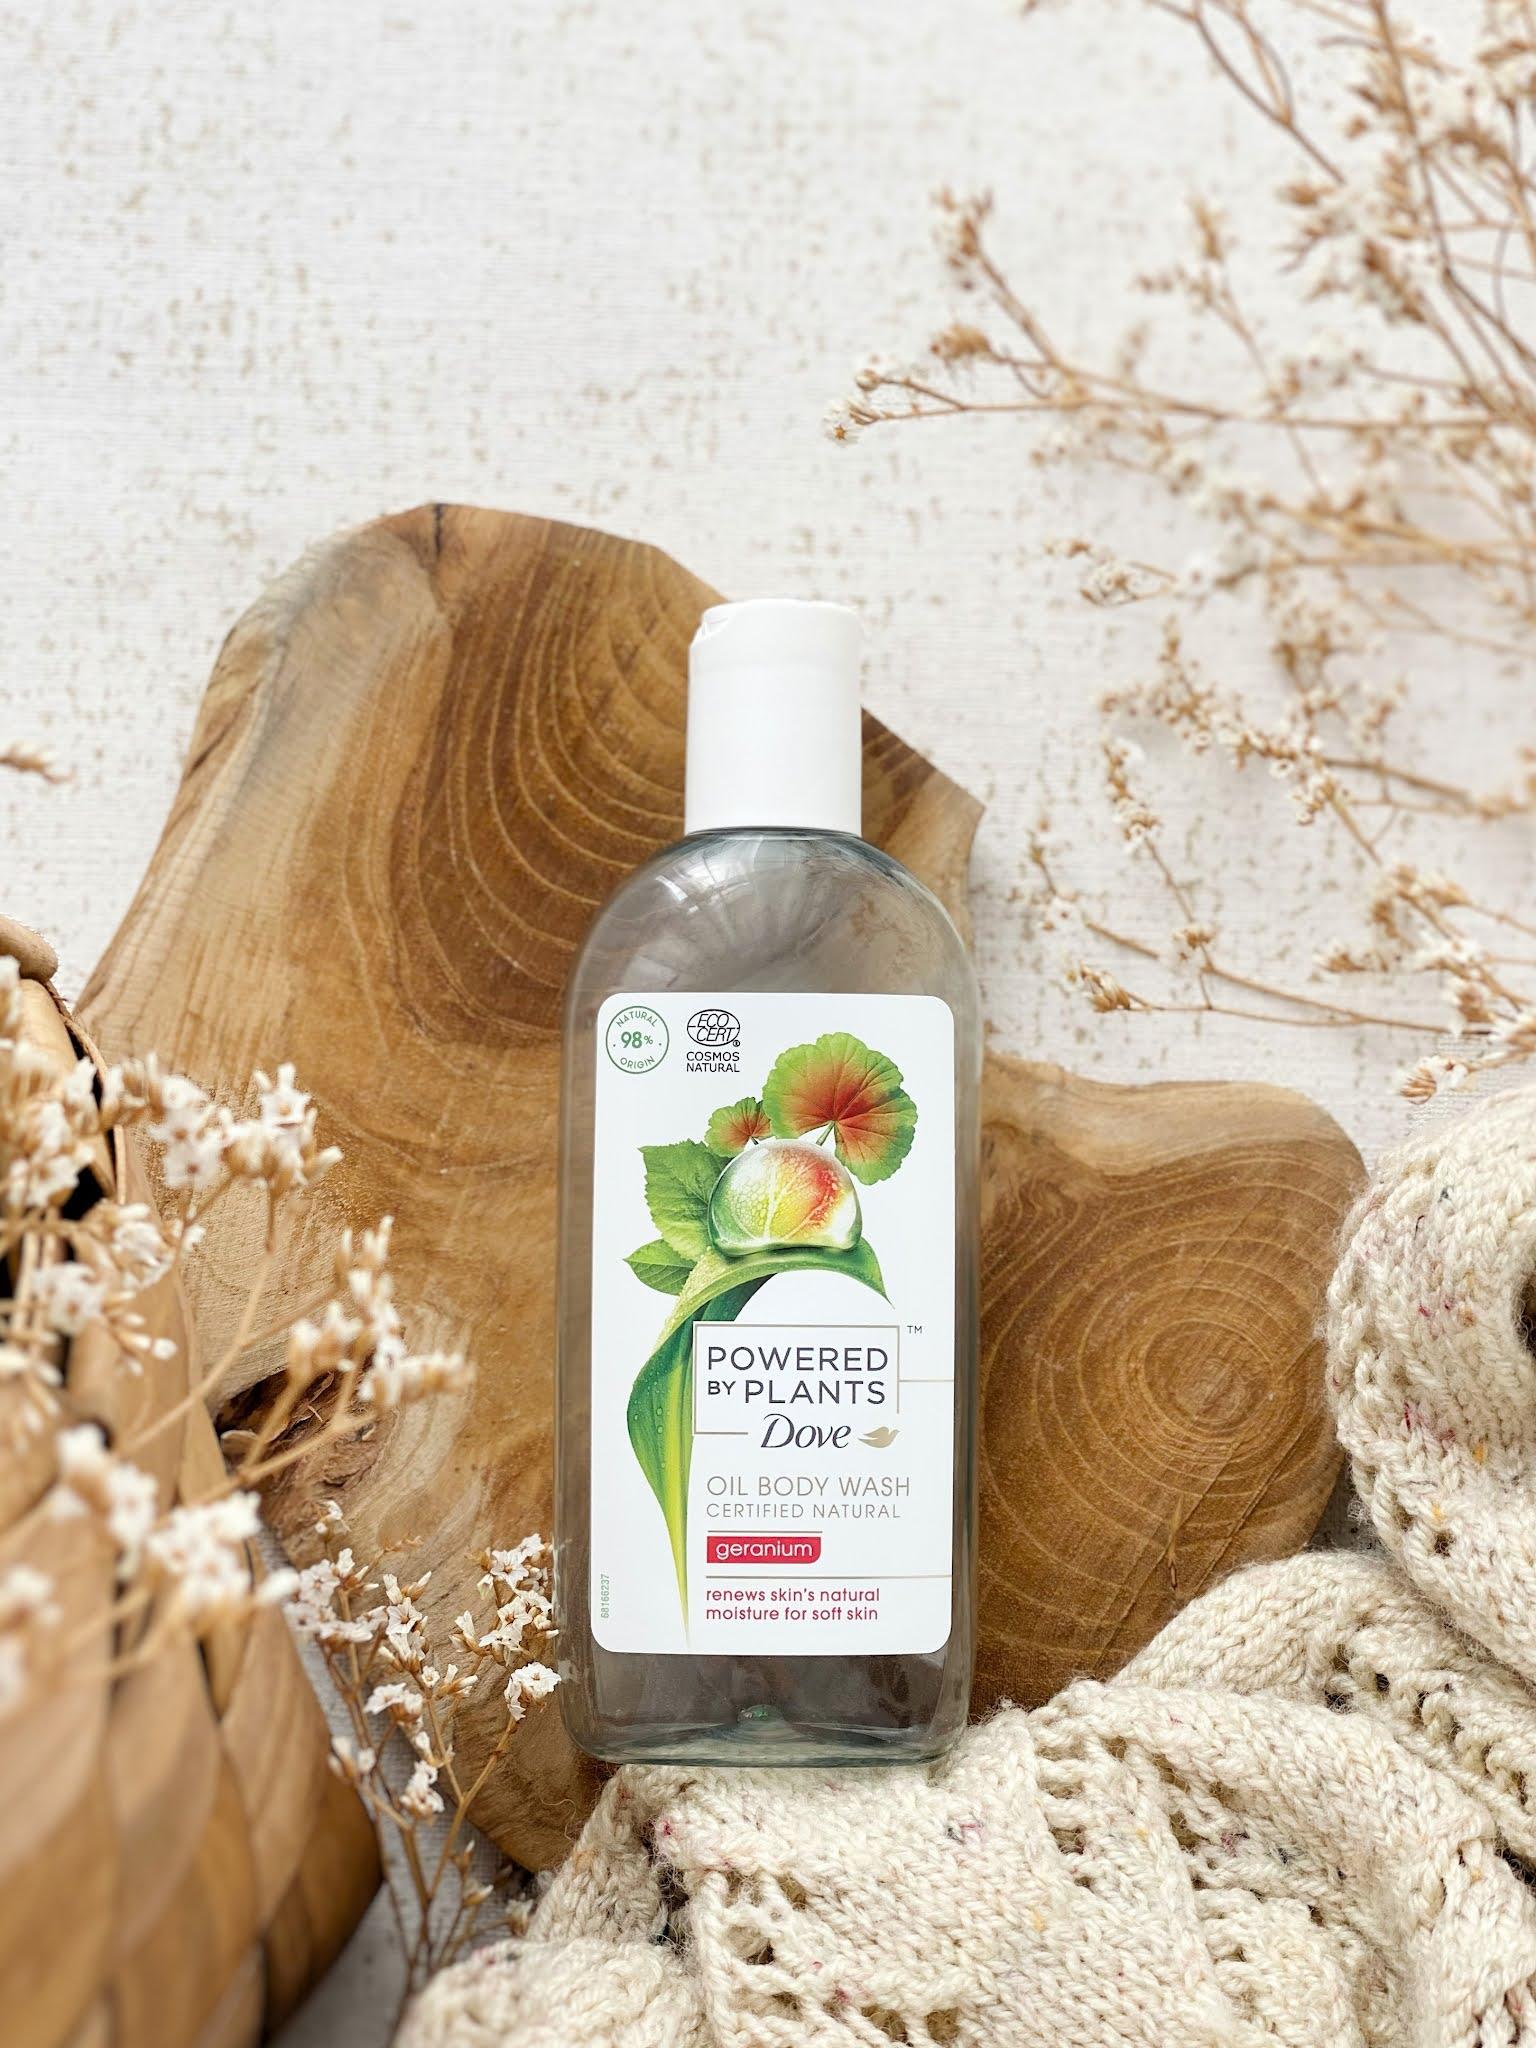 olejek-pod-prysznic-Dove-Powered-by-Plants-Geranium